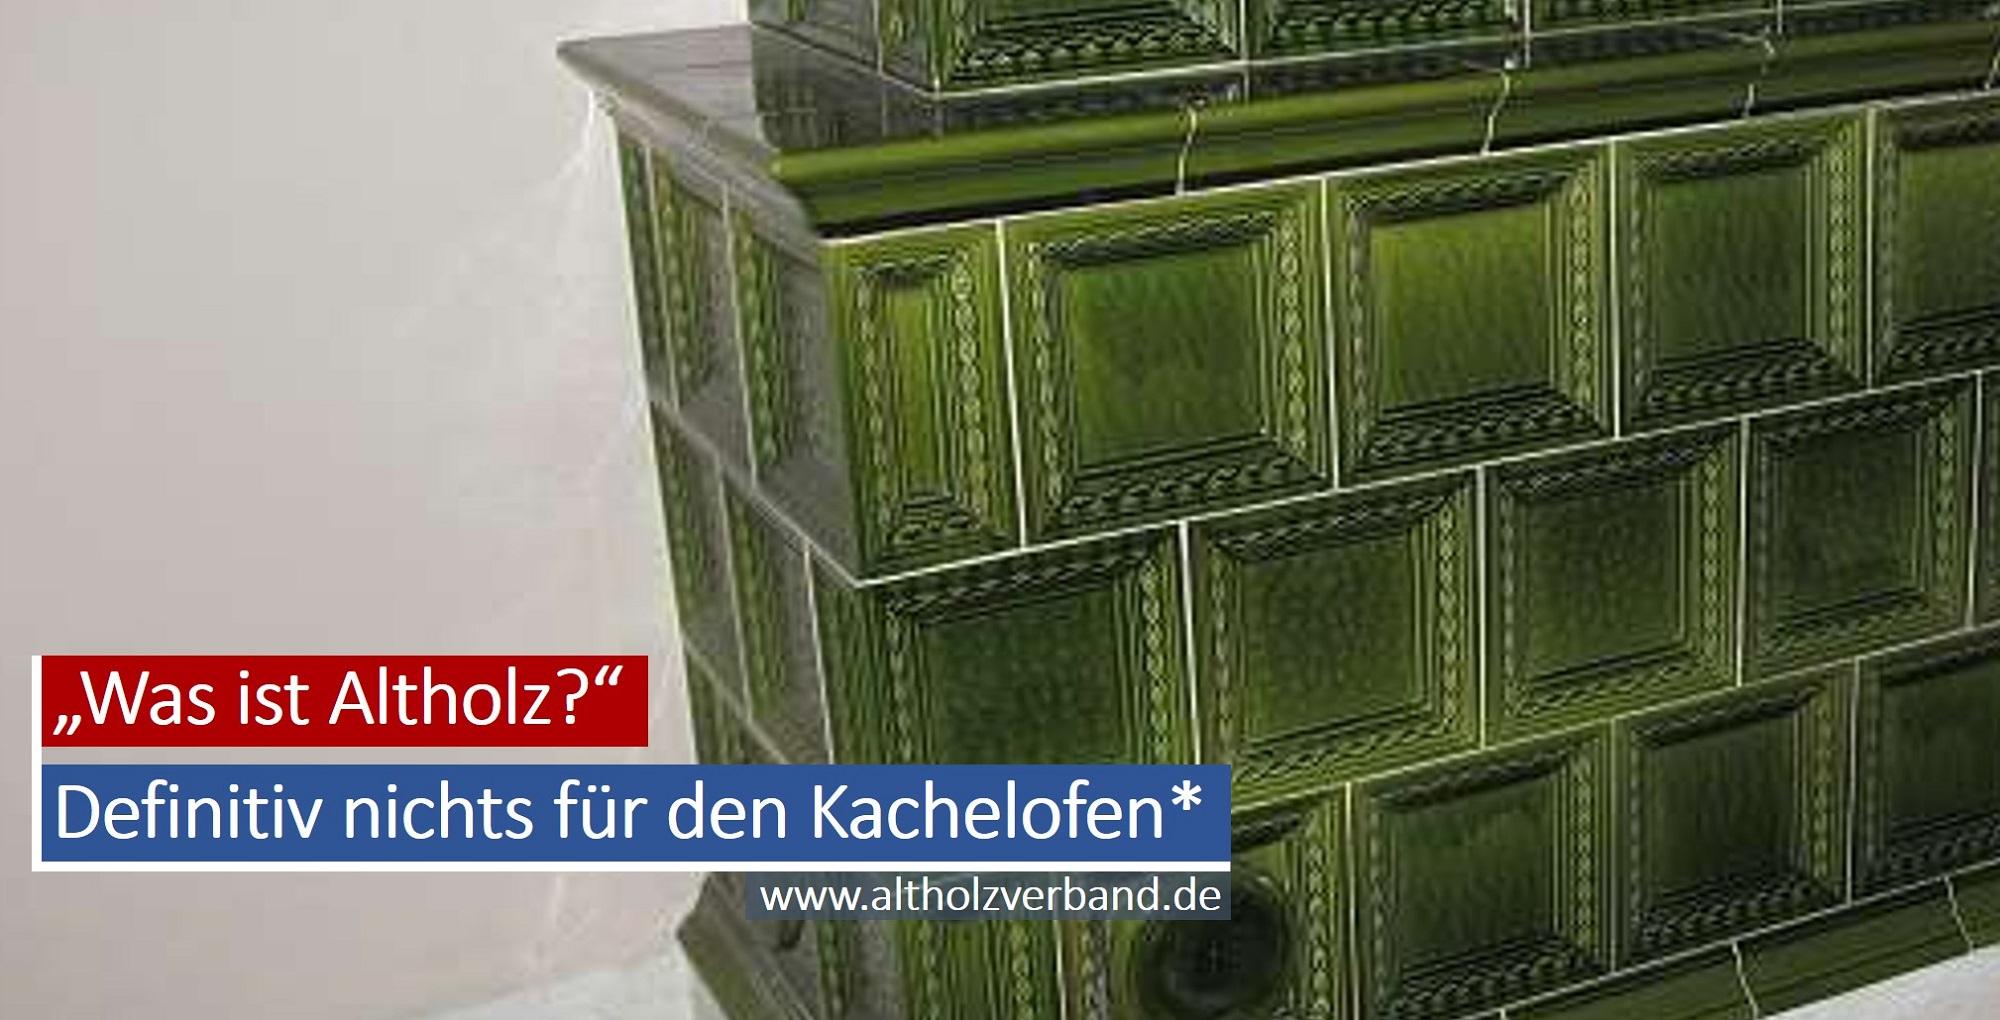 Top Altholz richtig entsorgen - Bundesverband der Altholzaufbereiter XE78